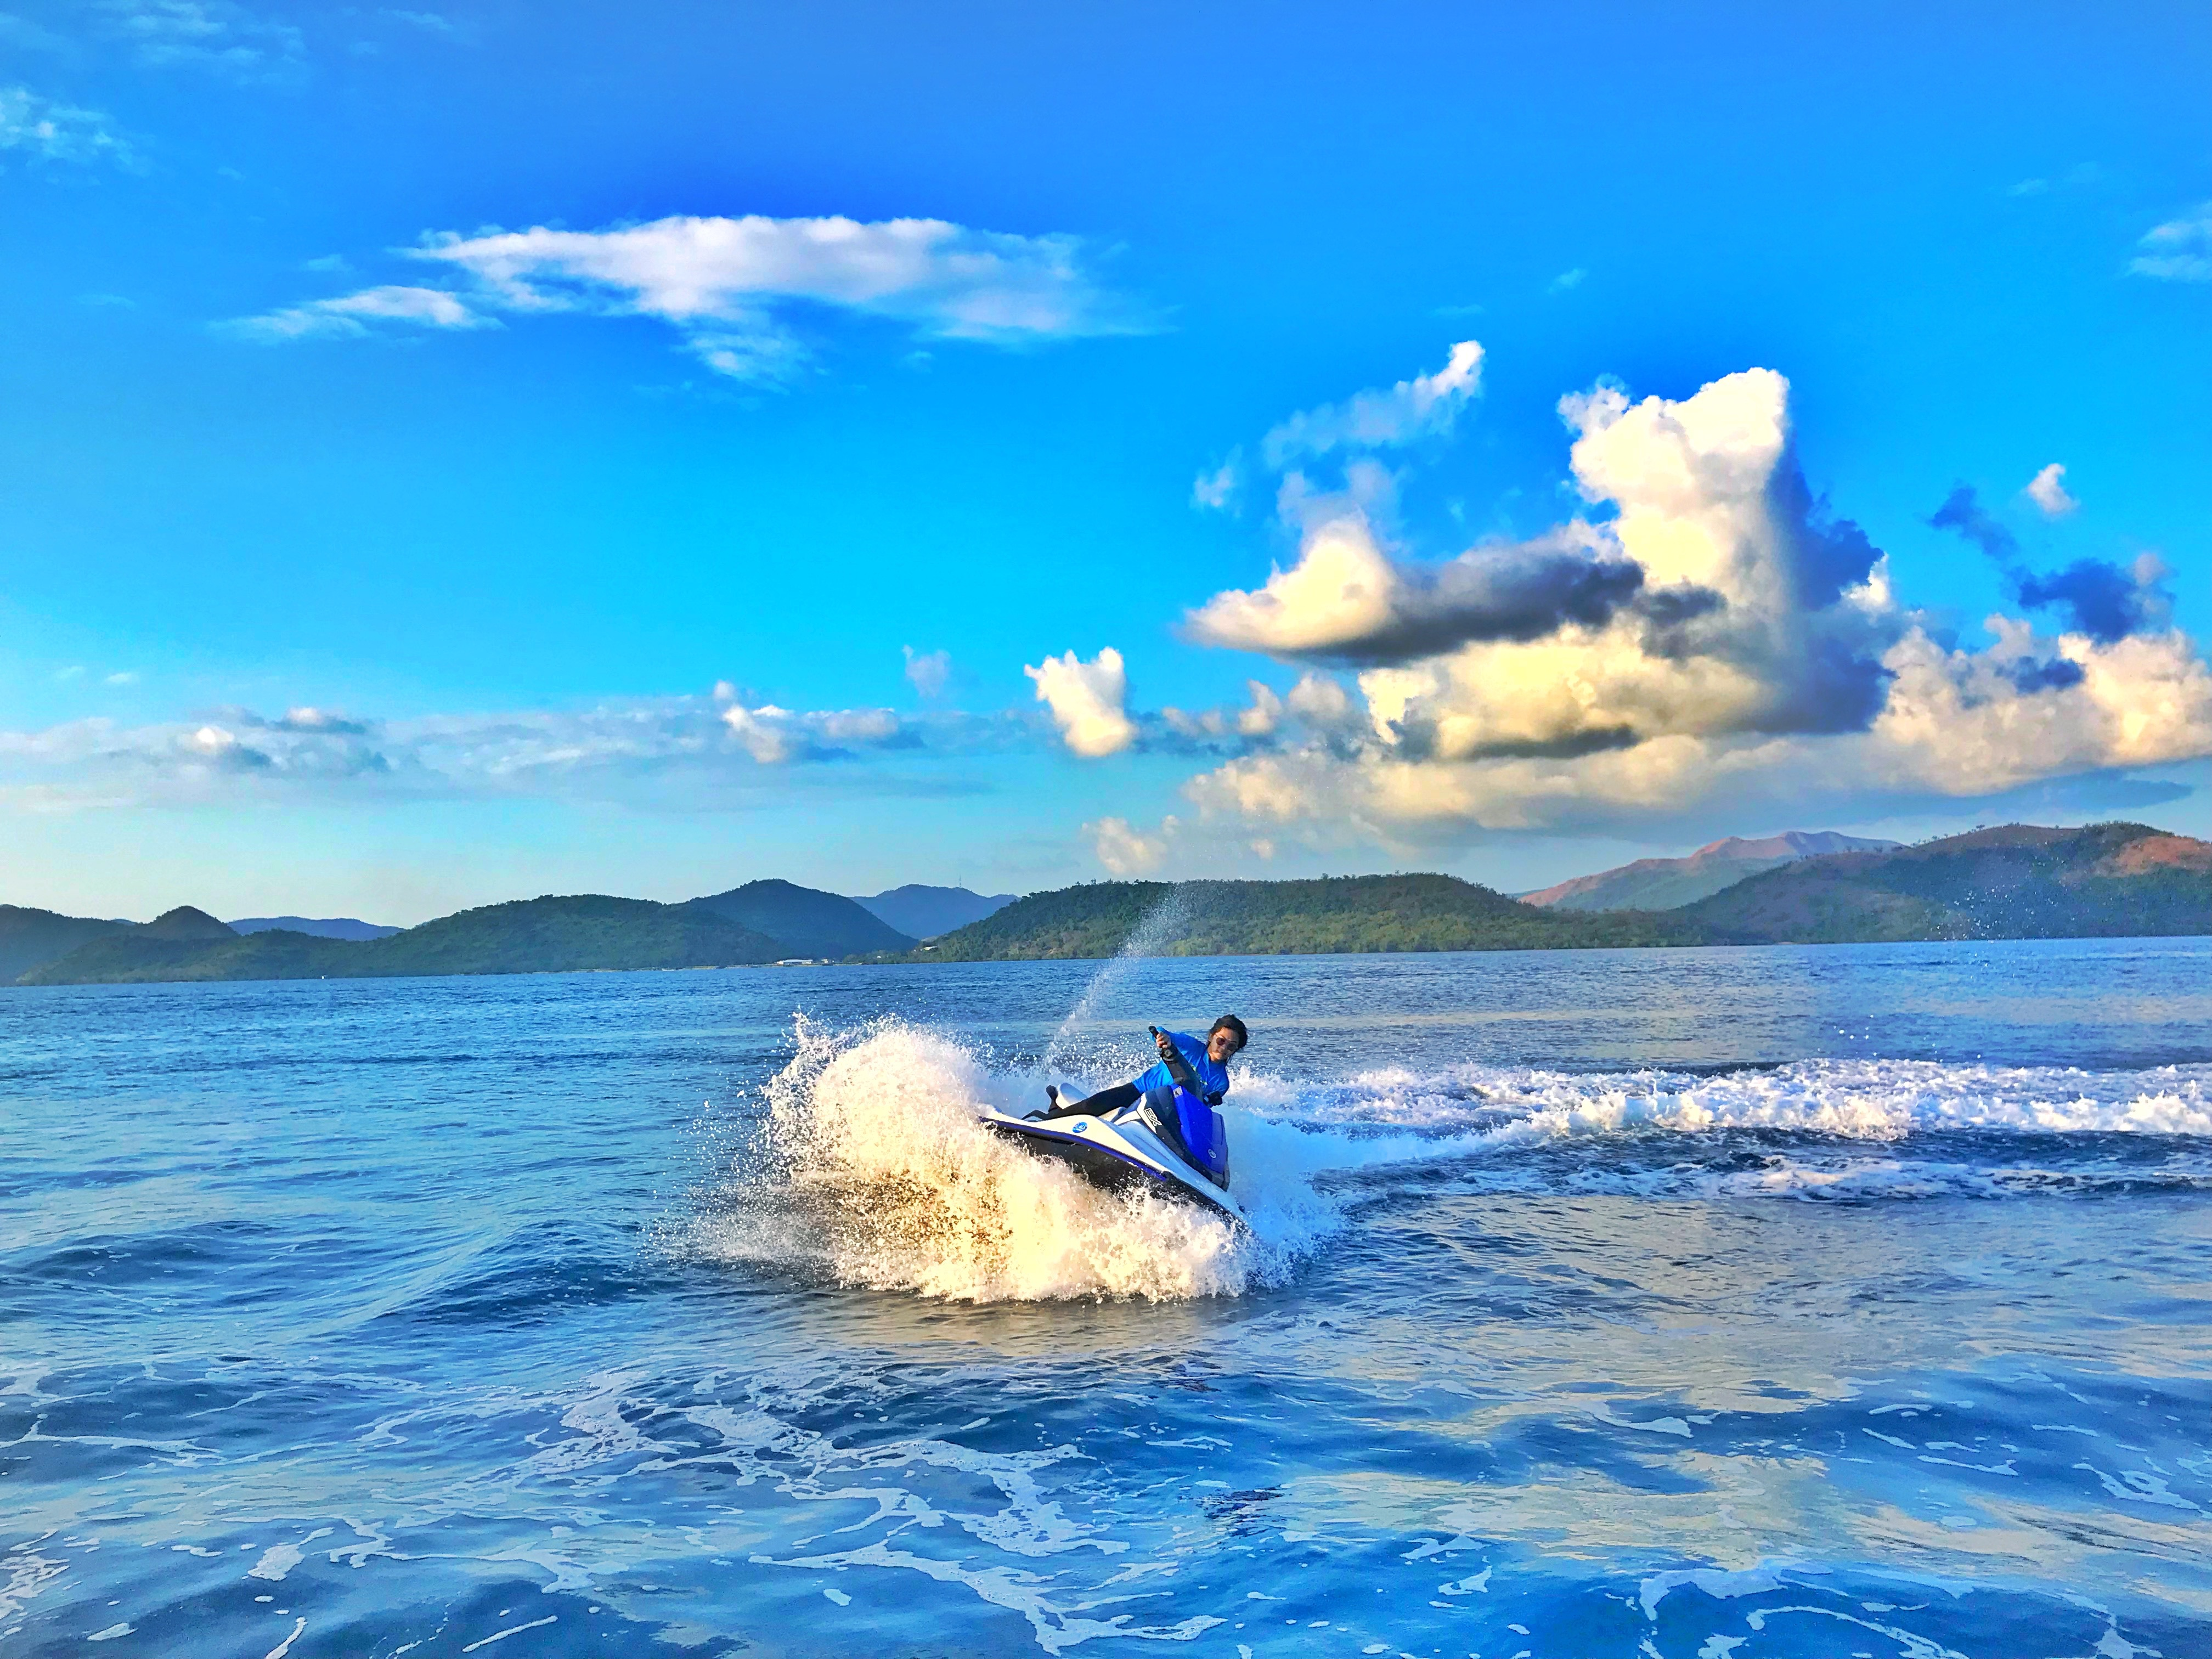 Coron Royal Island Watersports Jet Ski Experience   With Free Kayak